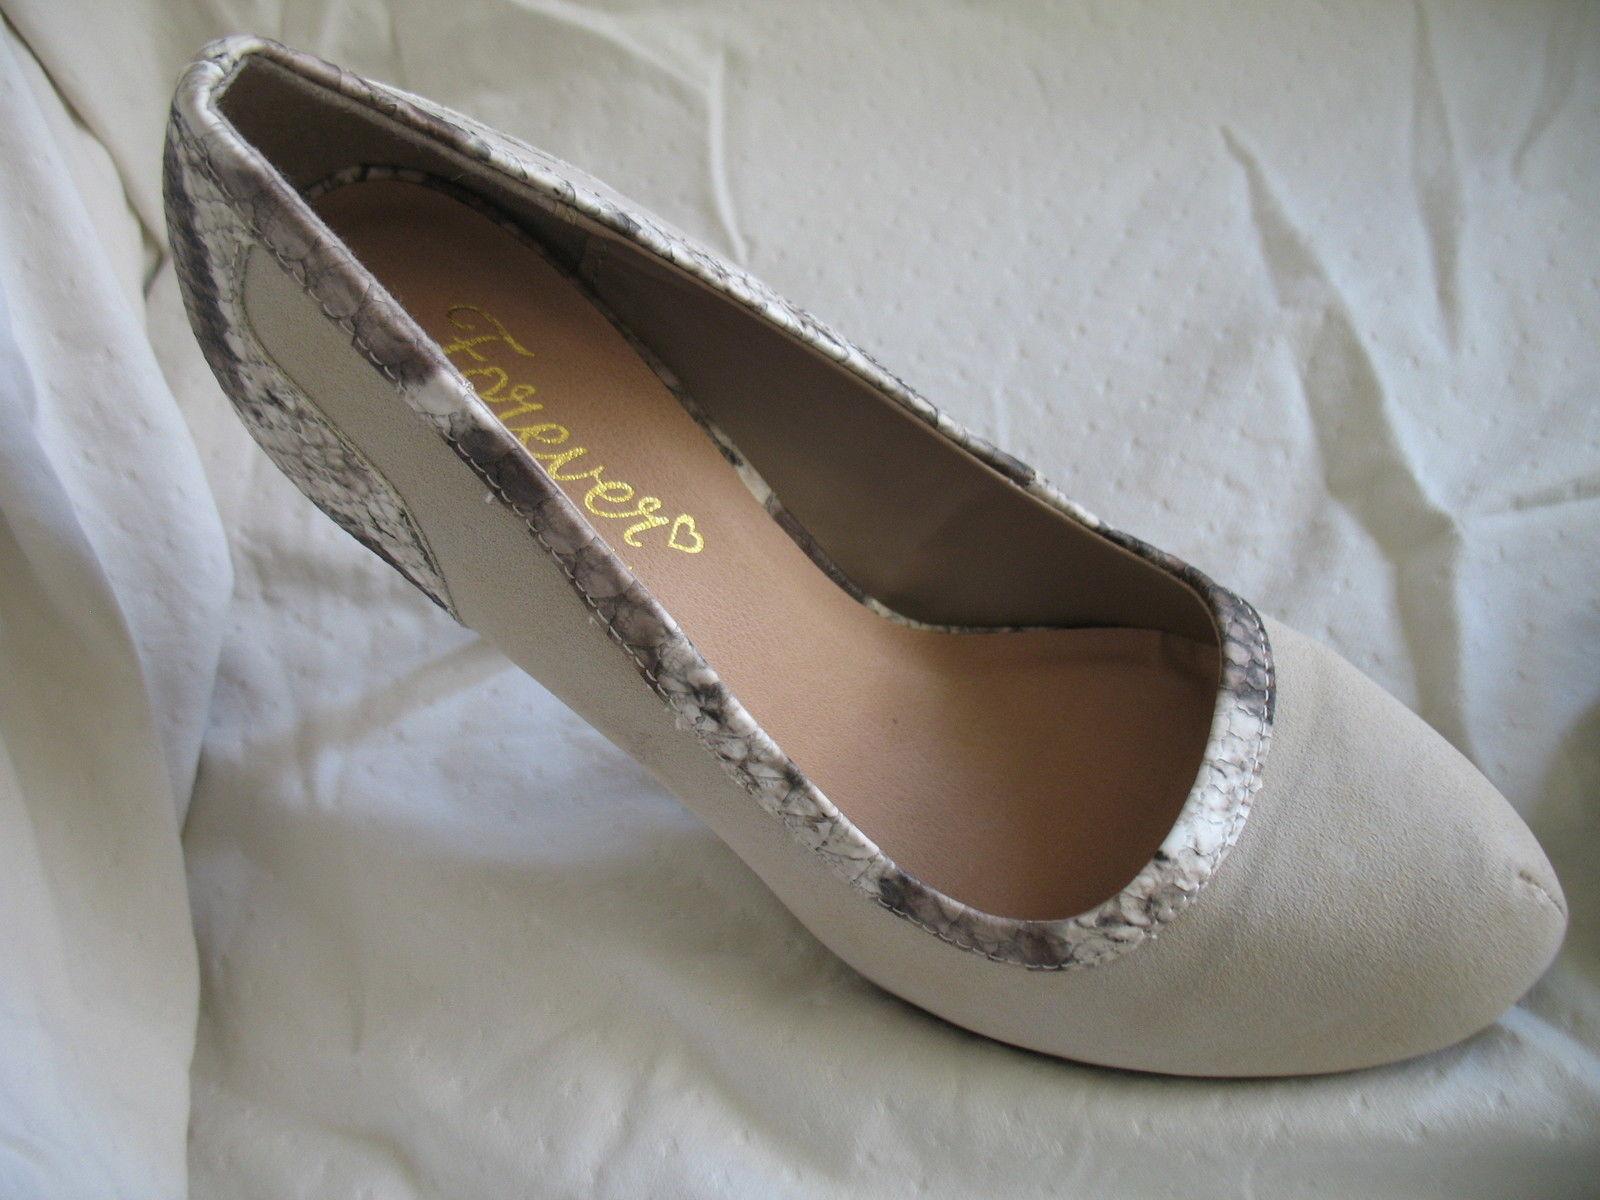 Forever Paula Abdul Size 8 Exotic Print Pump New High Heel Beige Avon Club Style image 4